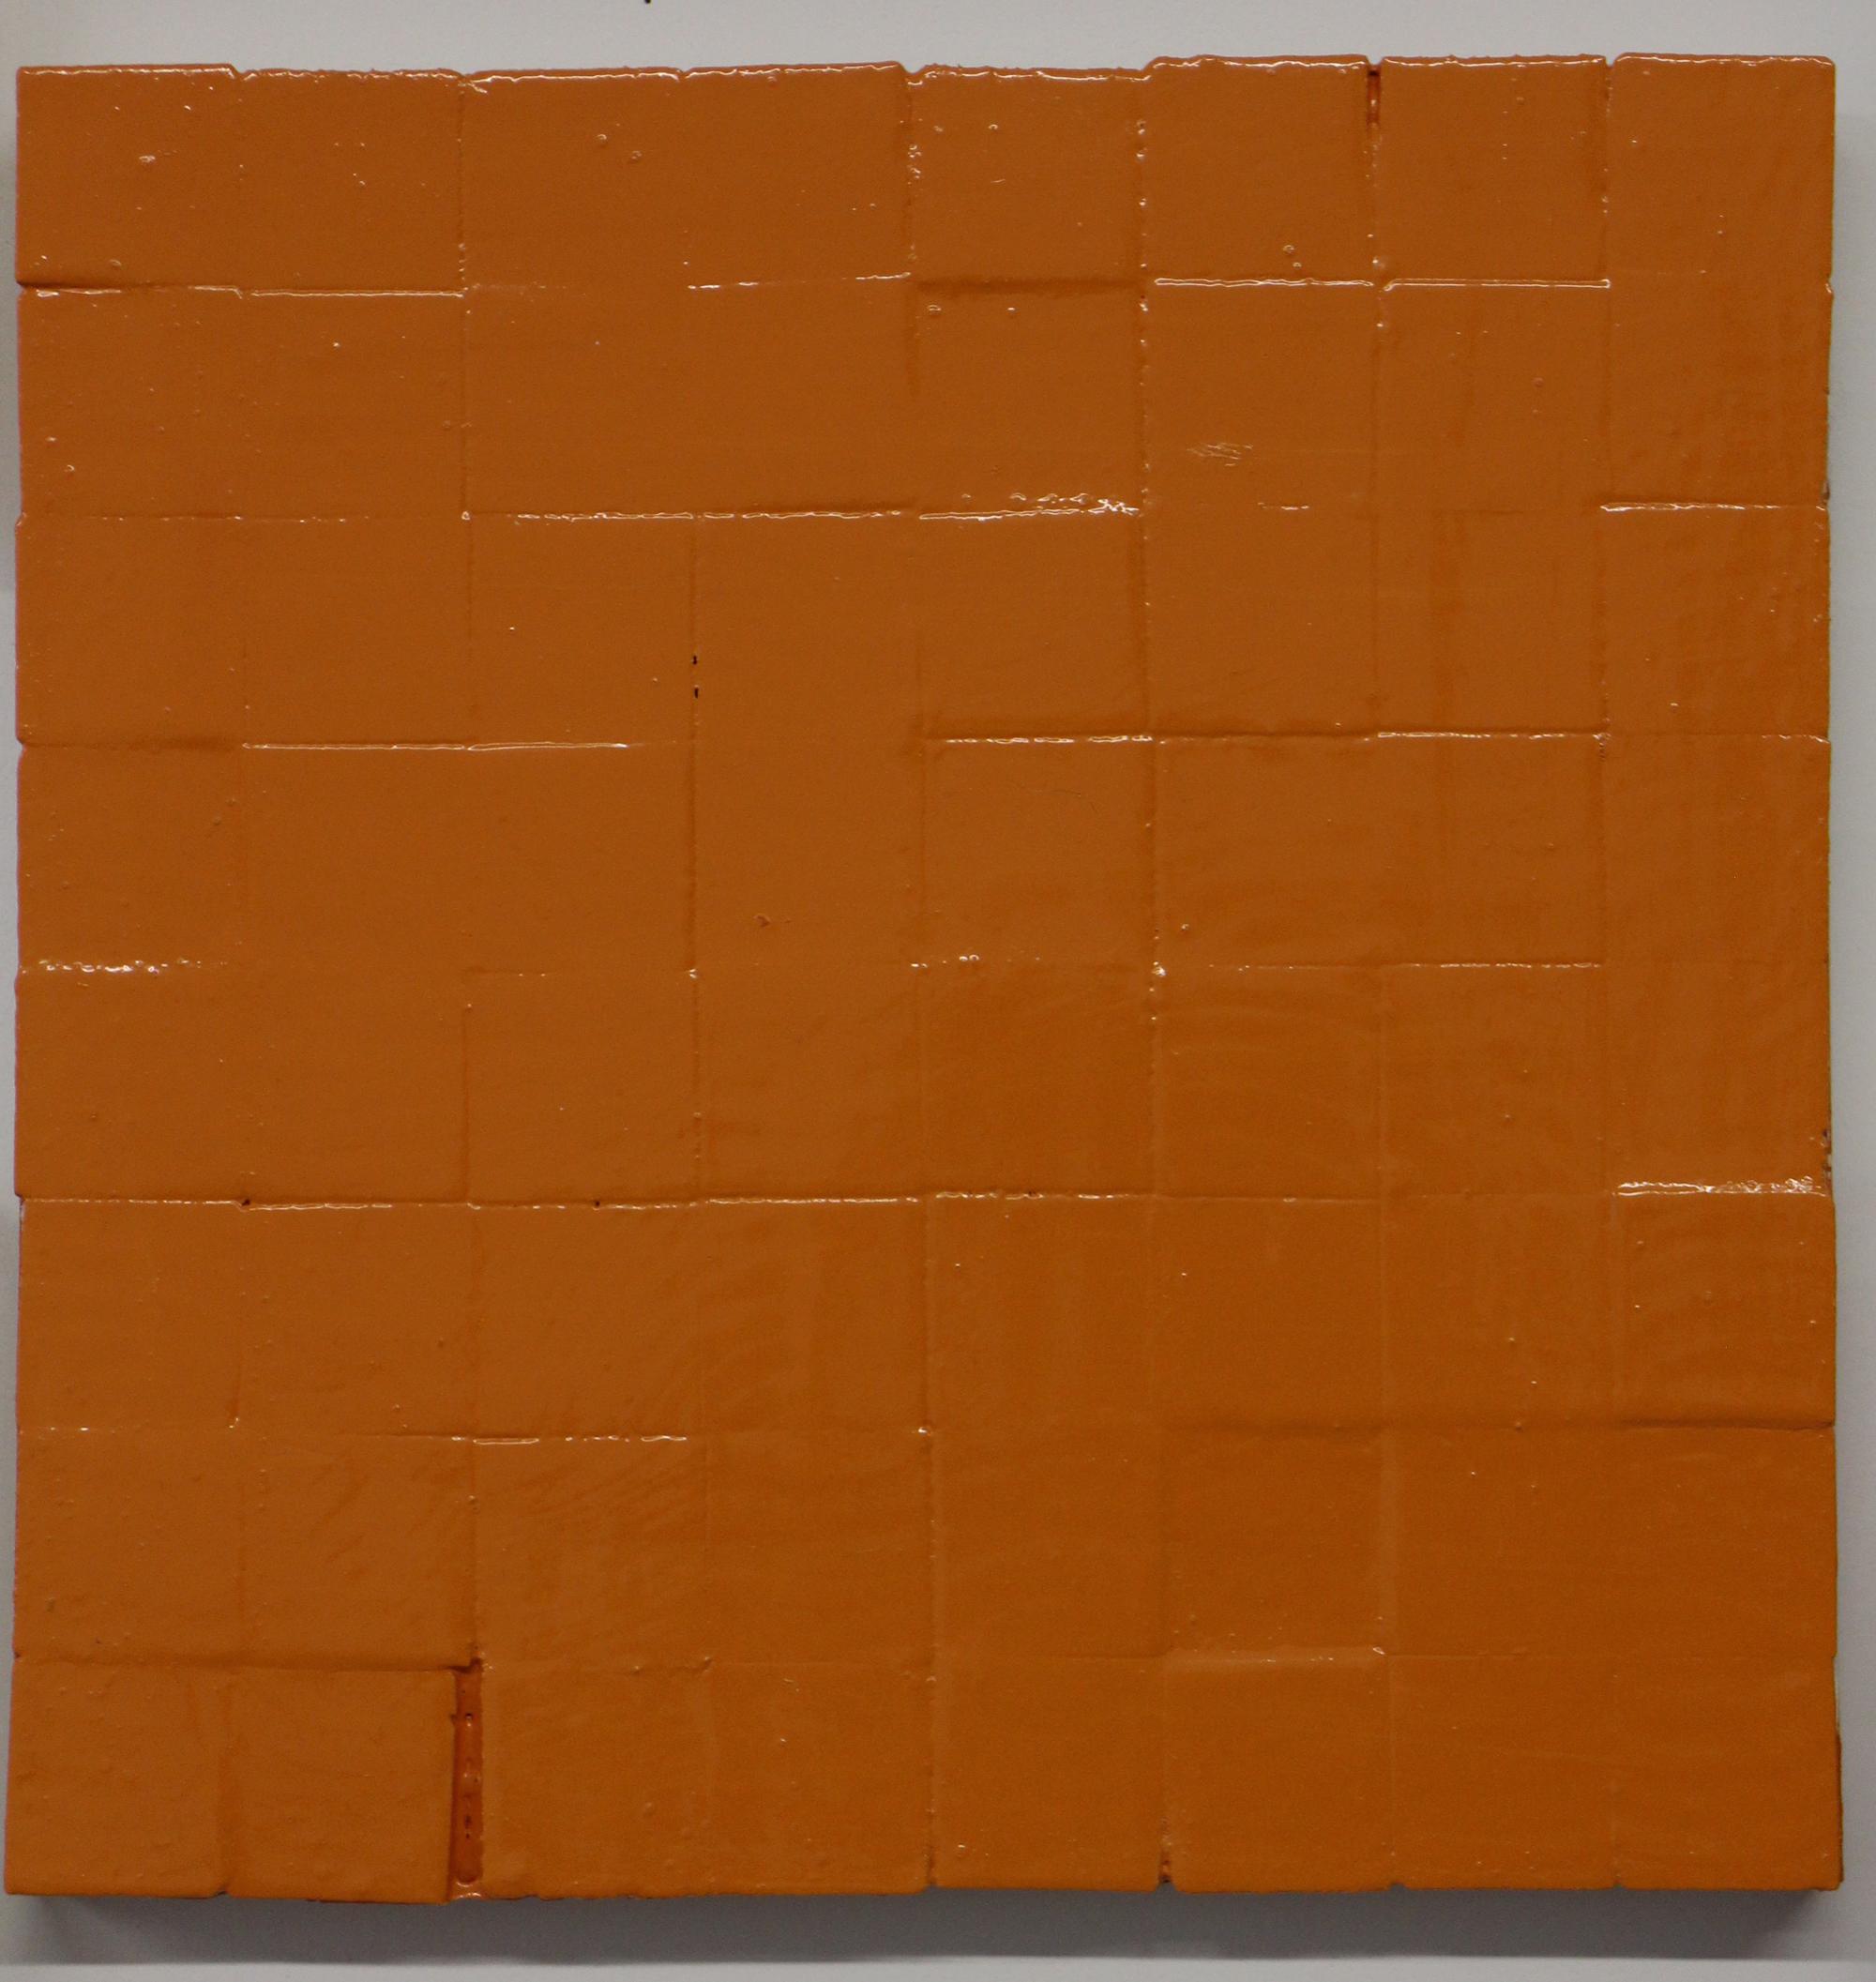 Orange Painting 3 2.9.16